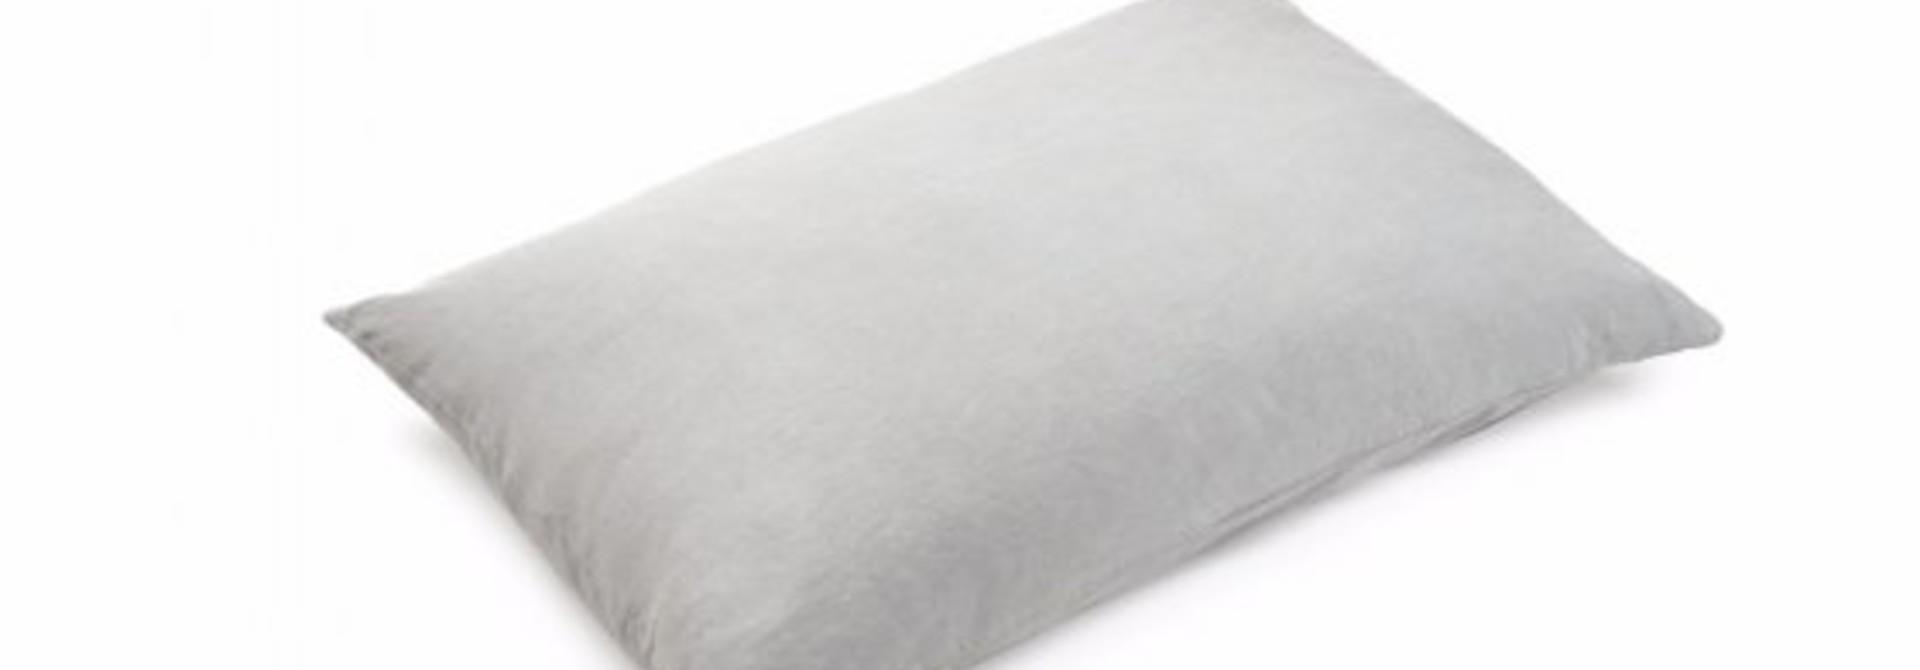 Pillow Sham - Heritage Ash- Queen